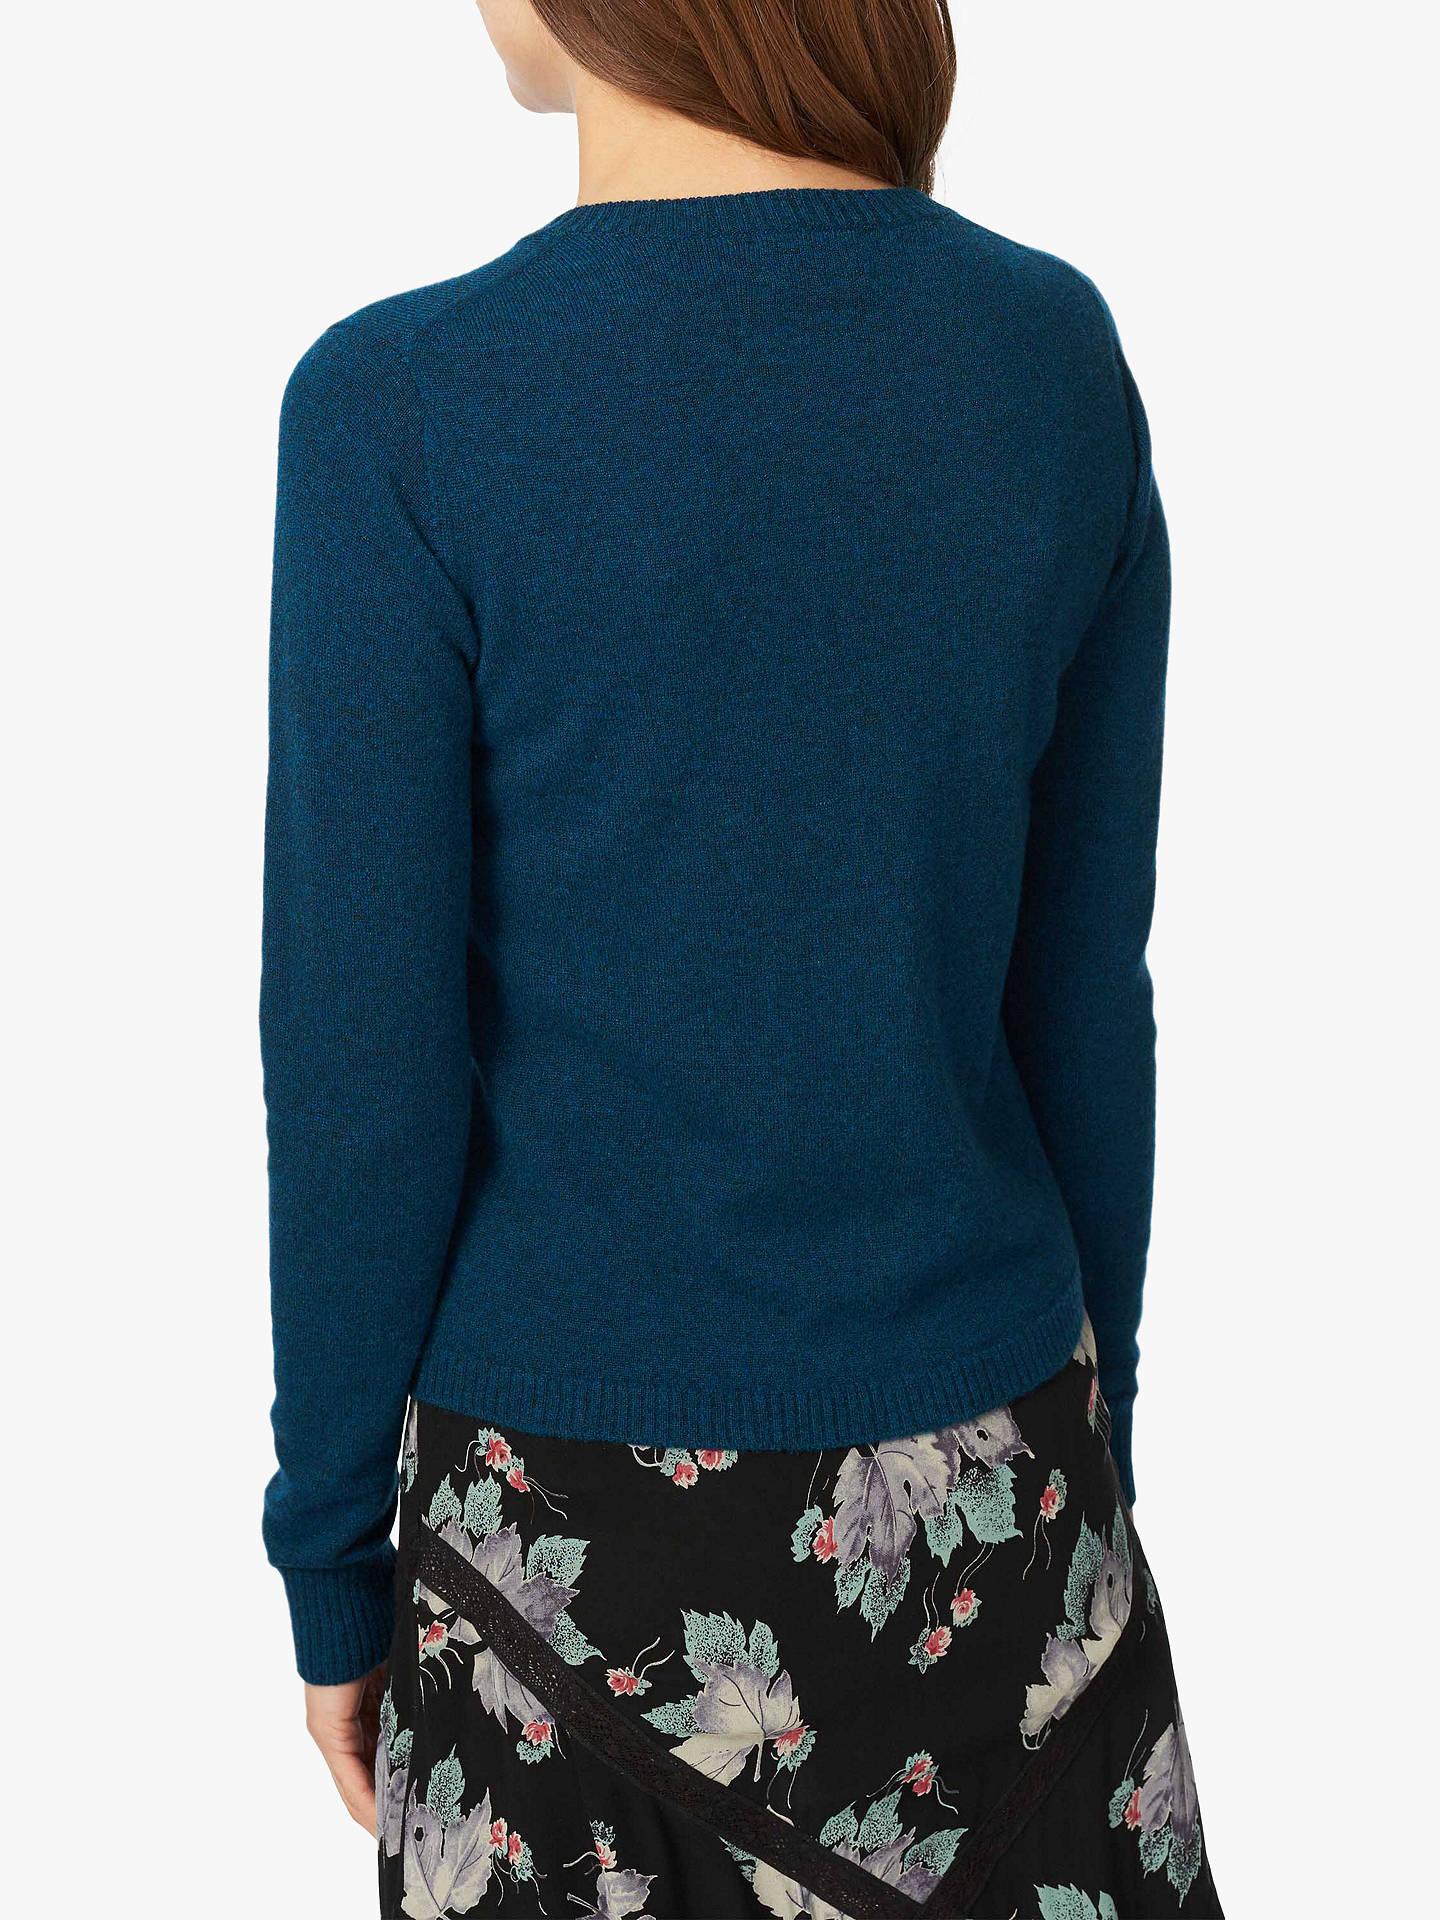 Brora Cashmere Velvet Detail Cardigan at John Lewis & Partners